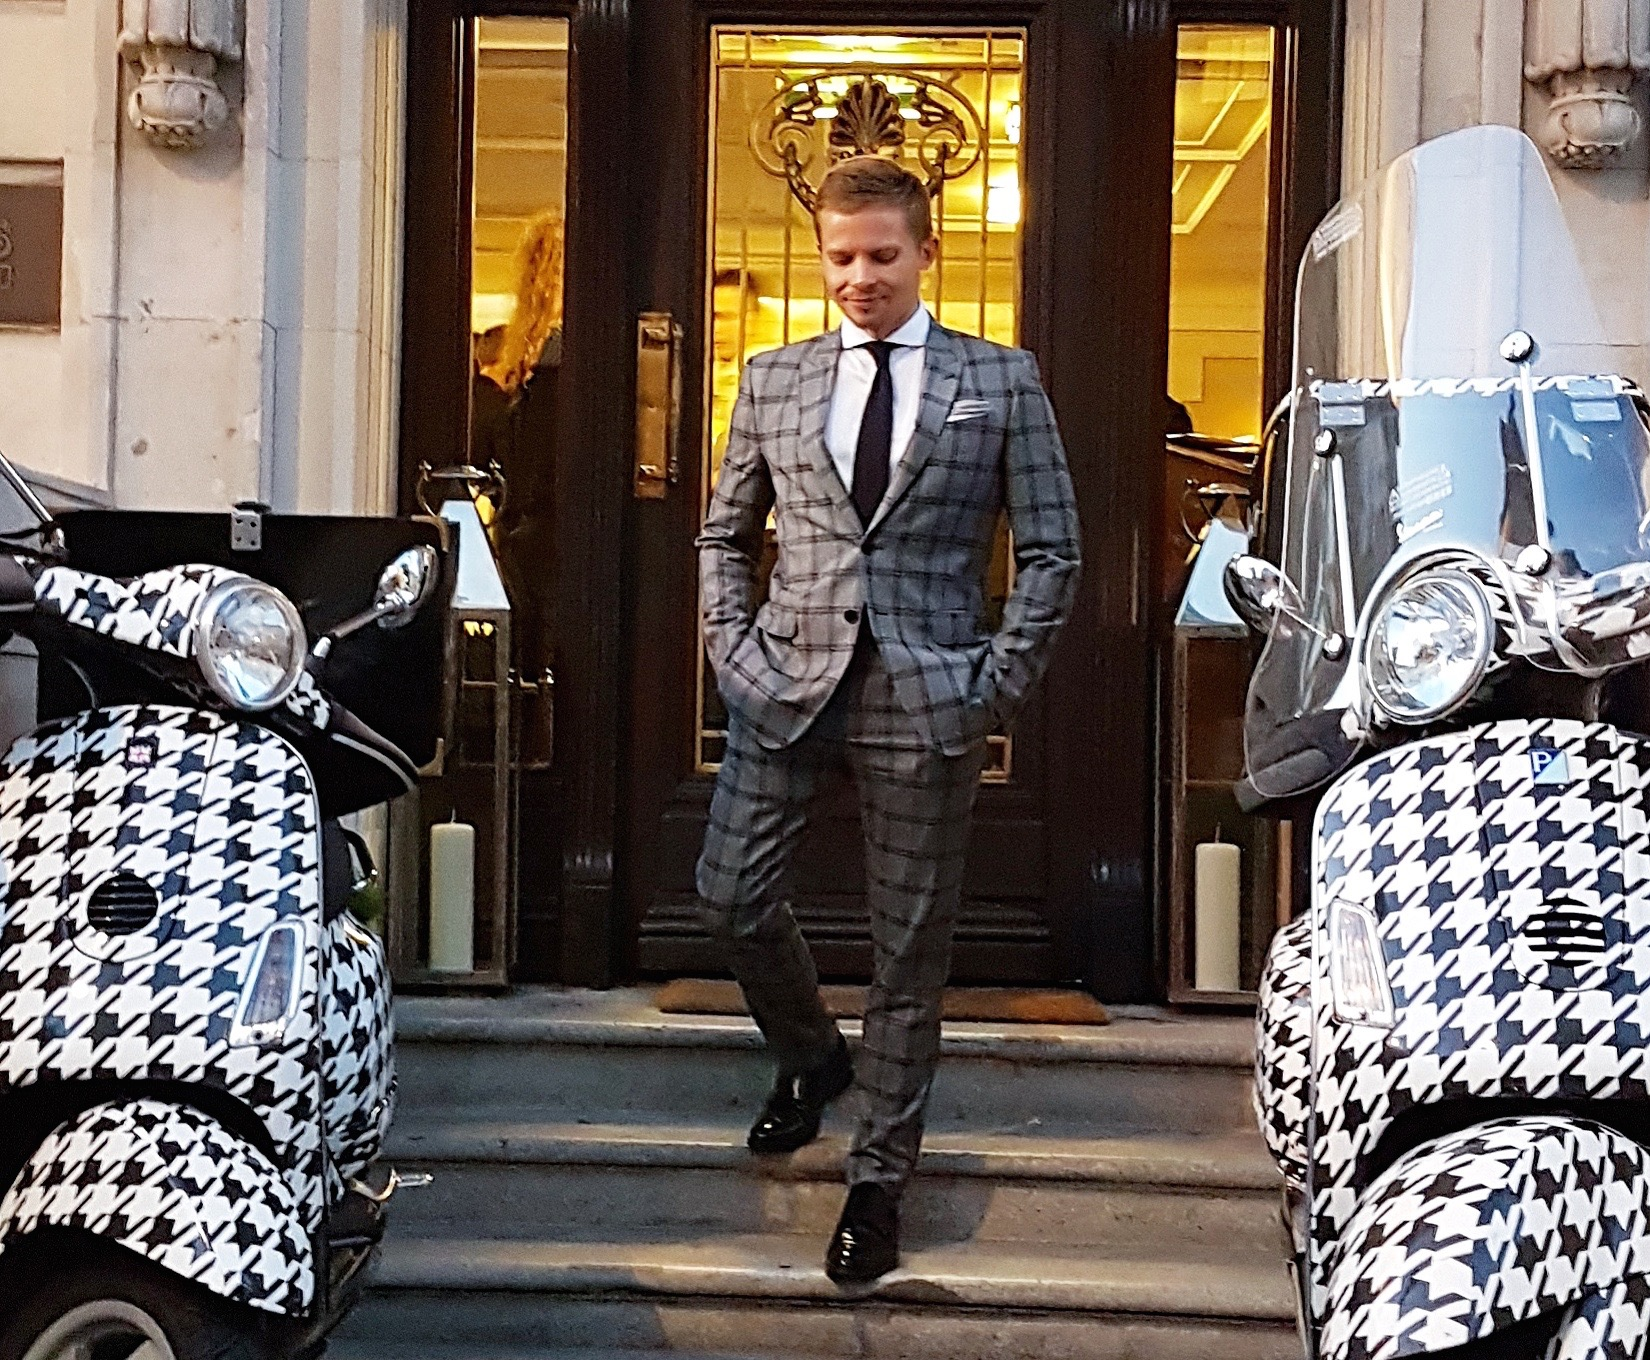 London Marriott Hotel Park Lane To Launch Mr. Mayfair For The International Gentleman This Autumn